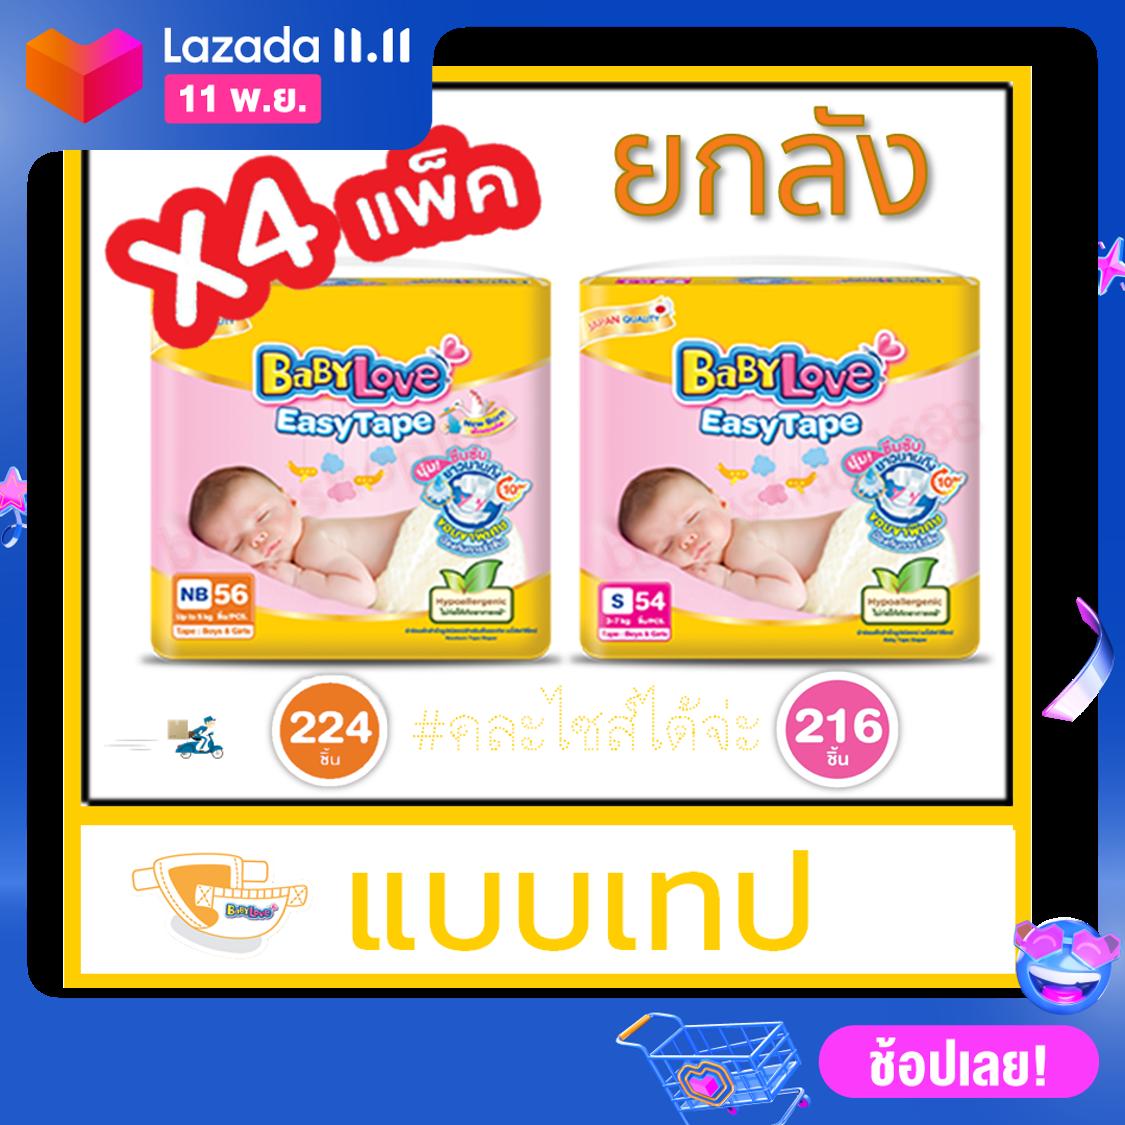 BabyLove Easy Tape เบบี้เลิฟ แพมเพิส ผ้าอ้อมเด็ก (ยกลังราคาถูก) ไซส์ S, NB 4 แพ็ค